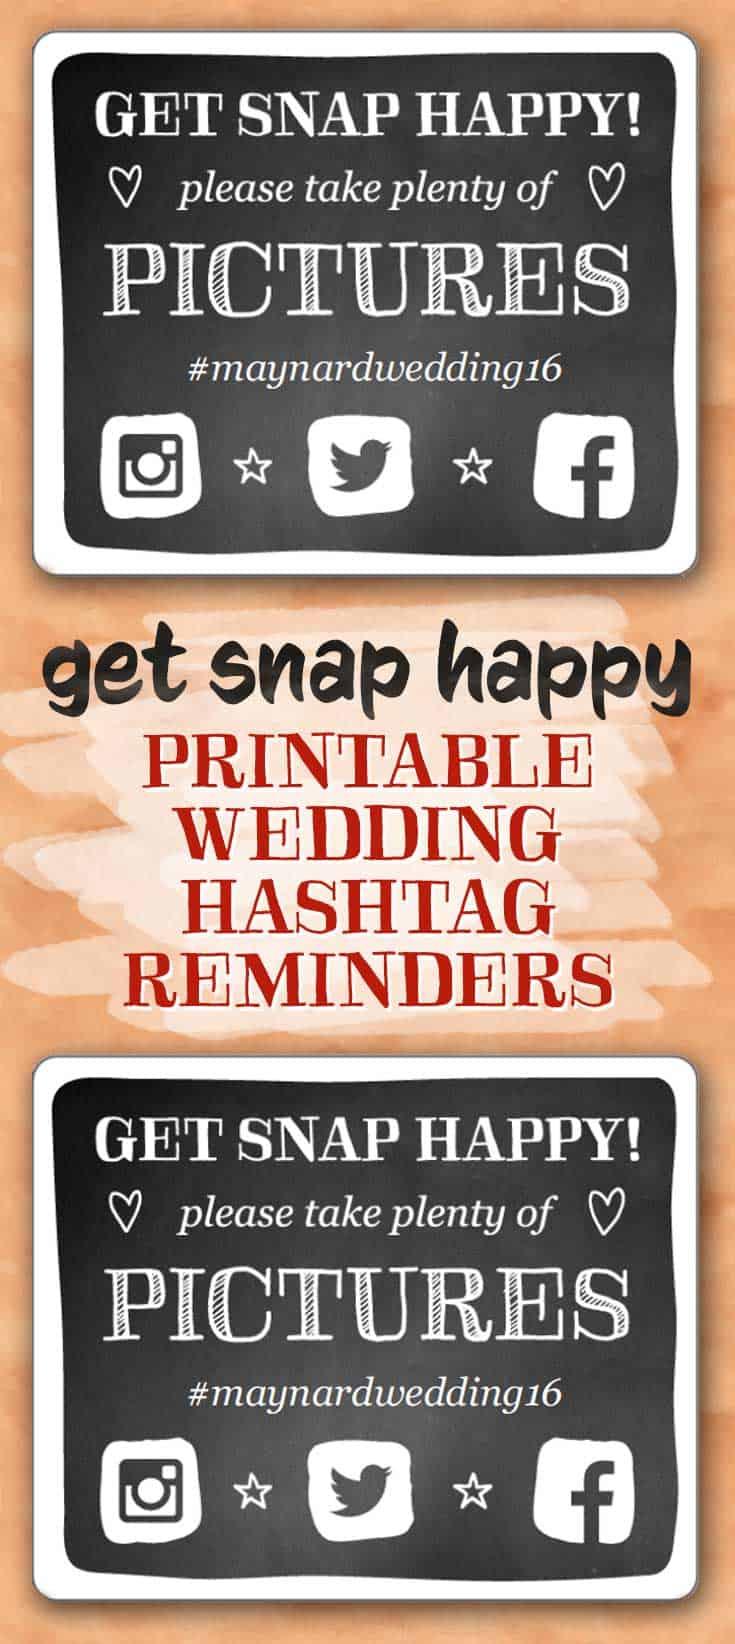 Calendar Cards Printables : Get snap happy wedding hashtag reminders free printables